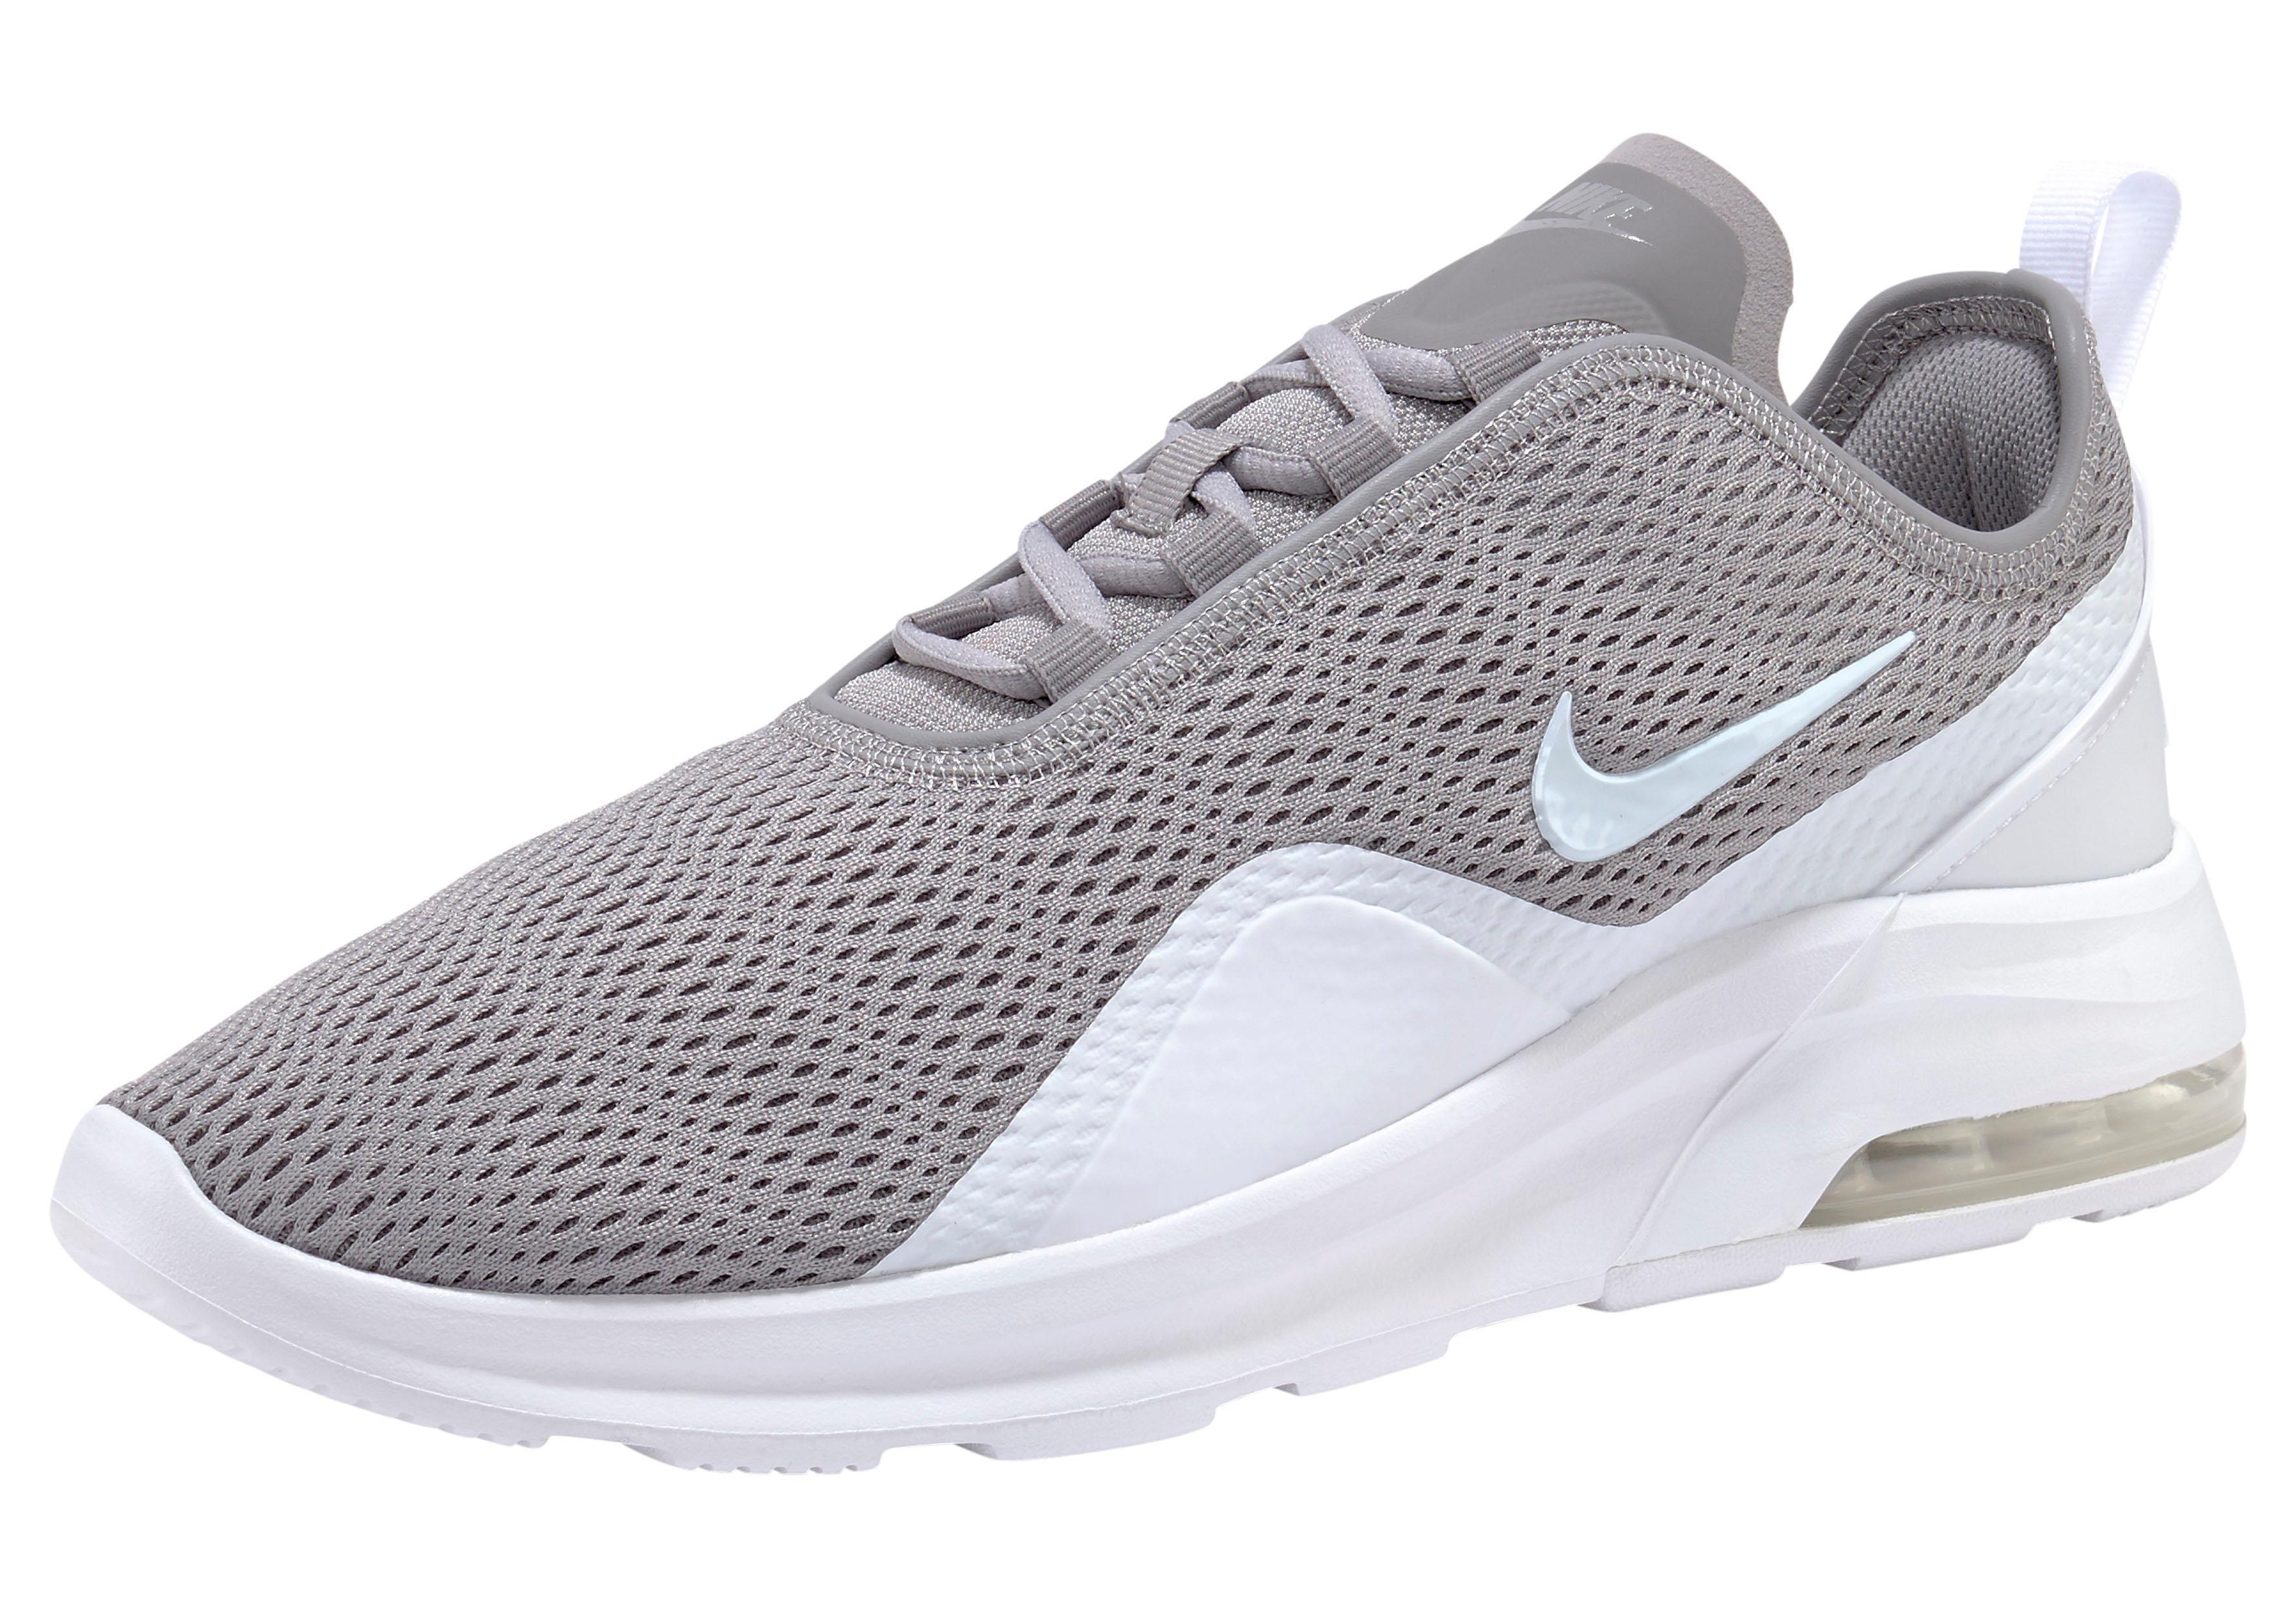 Vind Max Sneakersair 2 Motion Je Sportswear Nike Bij 54jRAL